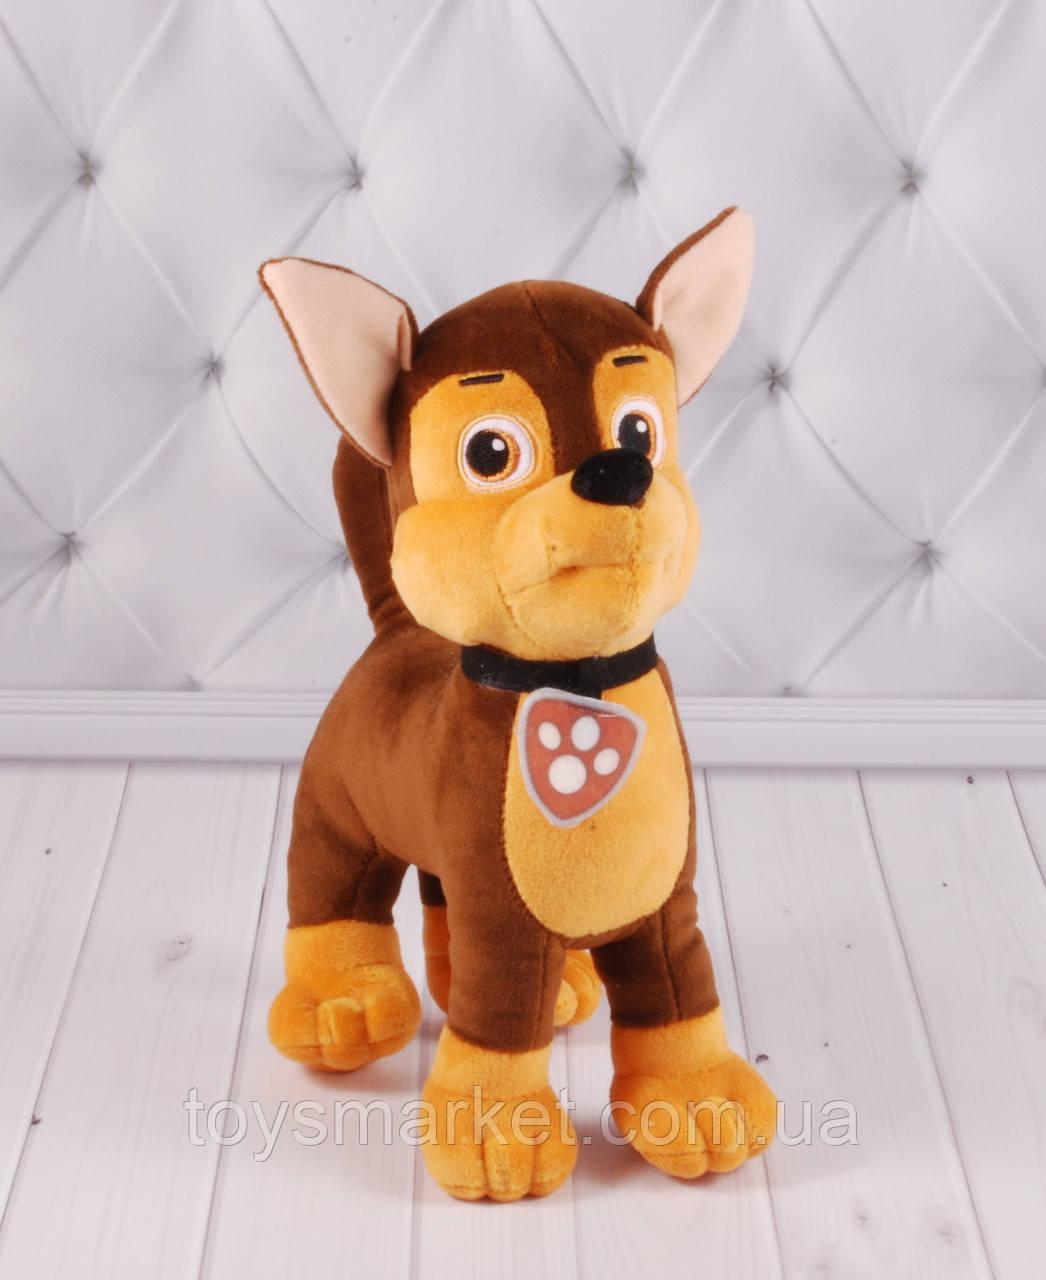 Мягкая игрушка щенок овчарка Товарищ, 32 см.